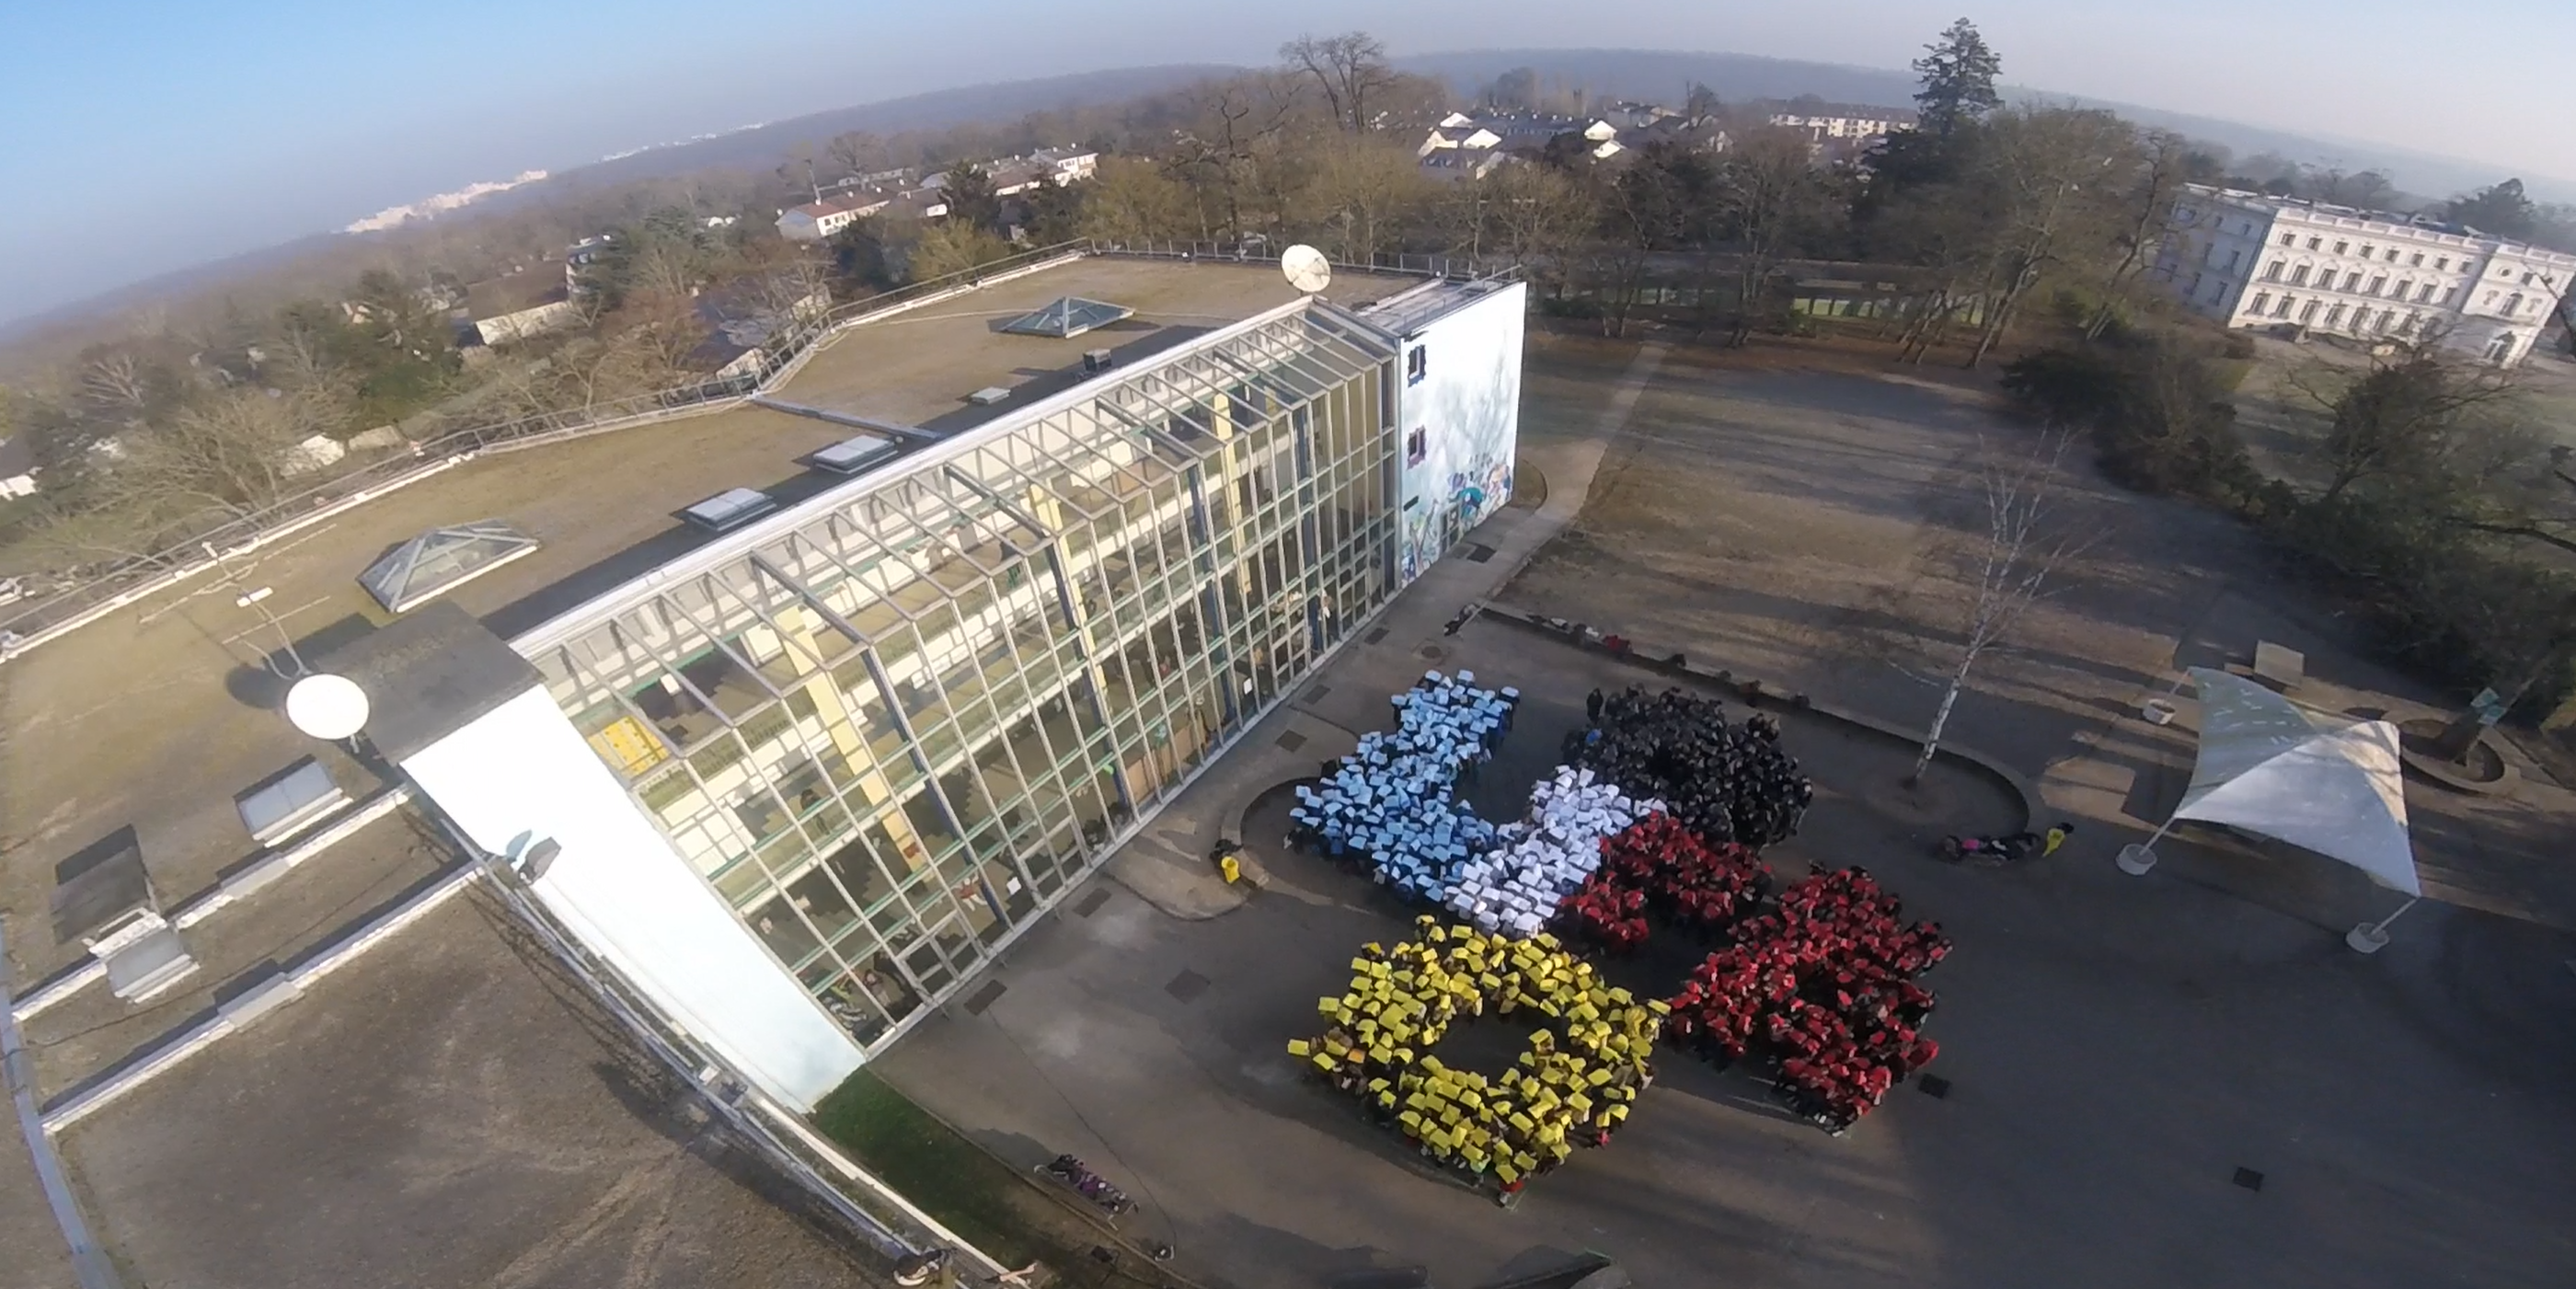 Veranstaltungen lycée franco allemand